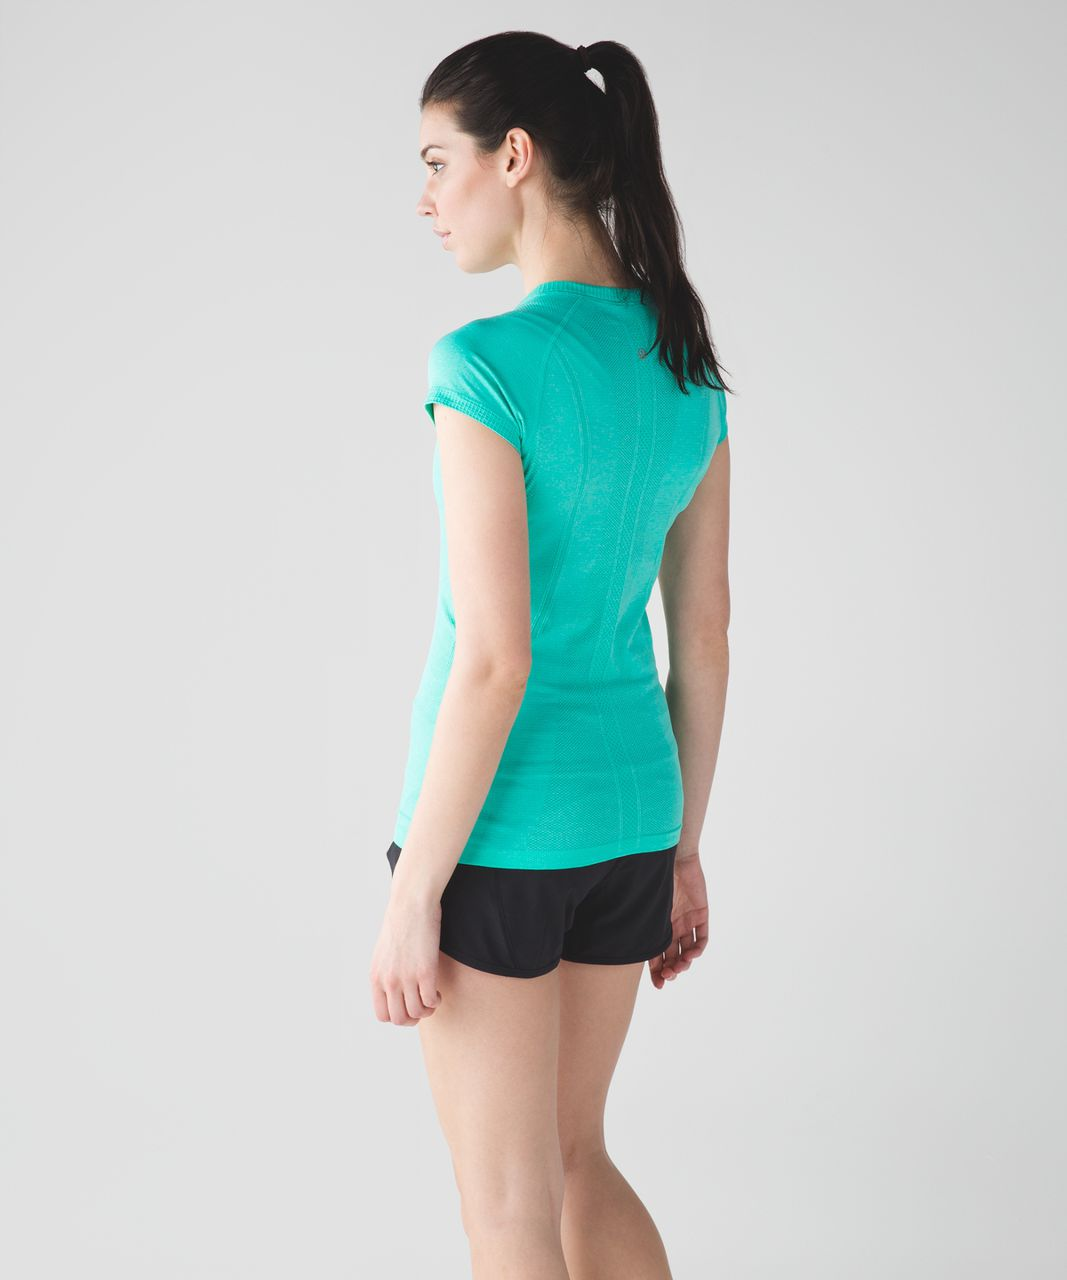 Lululemon Swiftly Tech Short Sleeve Crew - Heathered Bali Breeze